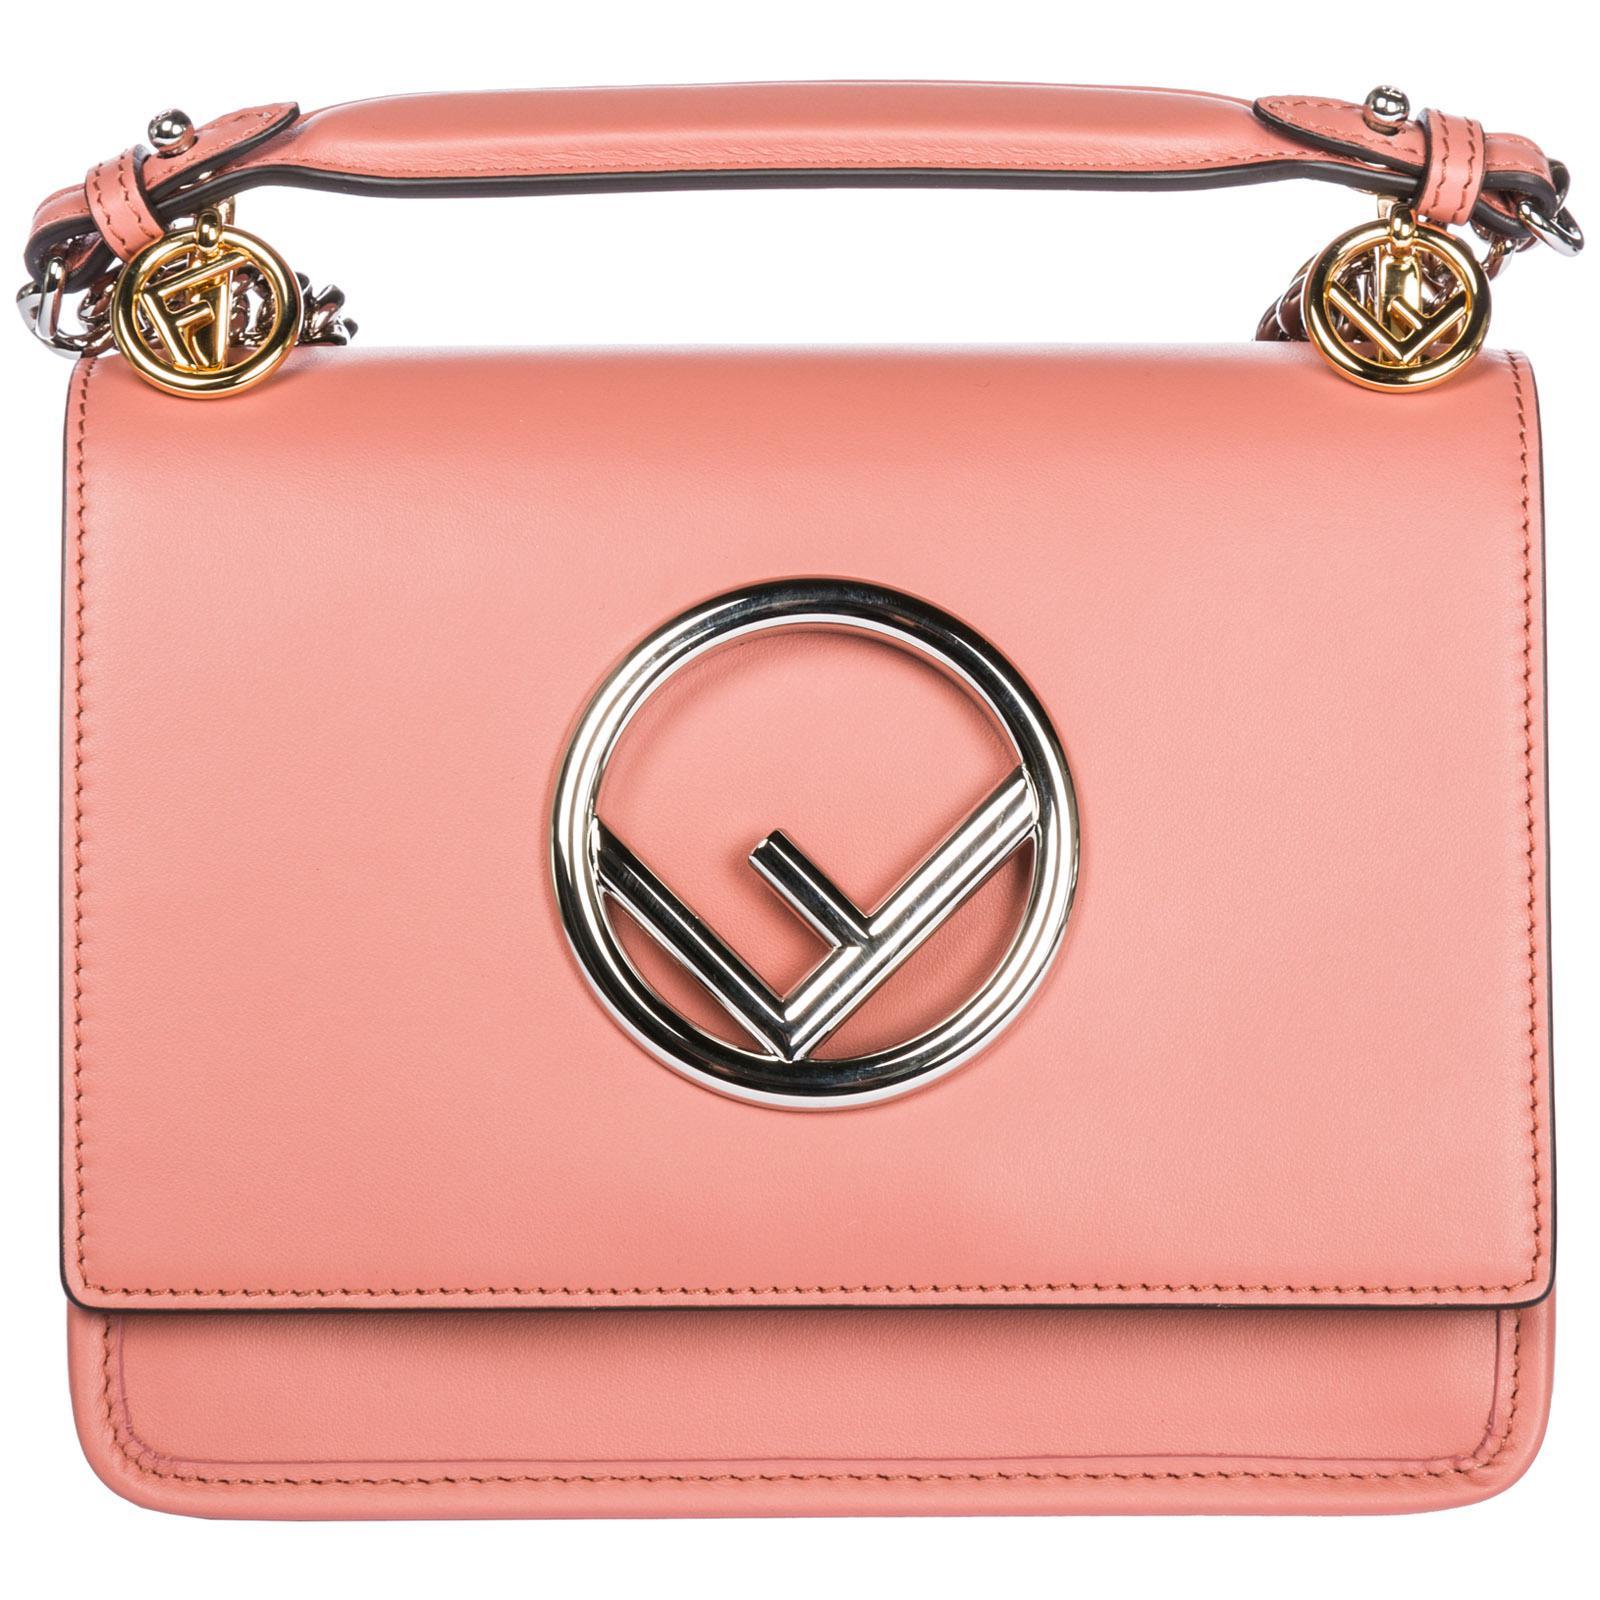 8cae8adbad07 Lyst - Fendi Leather Shoulder Bag Kan I Piccola Logo in Pink